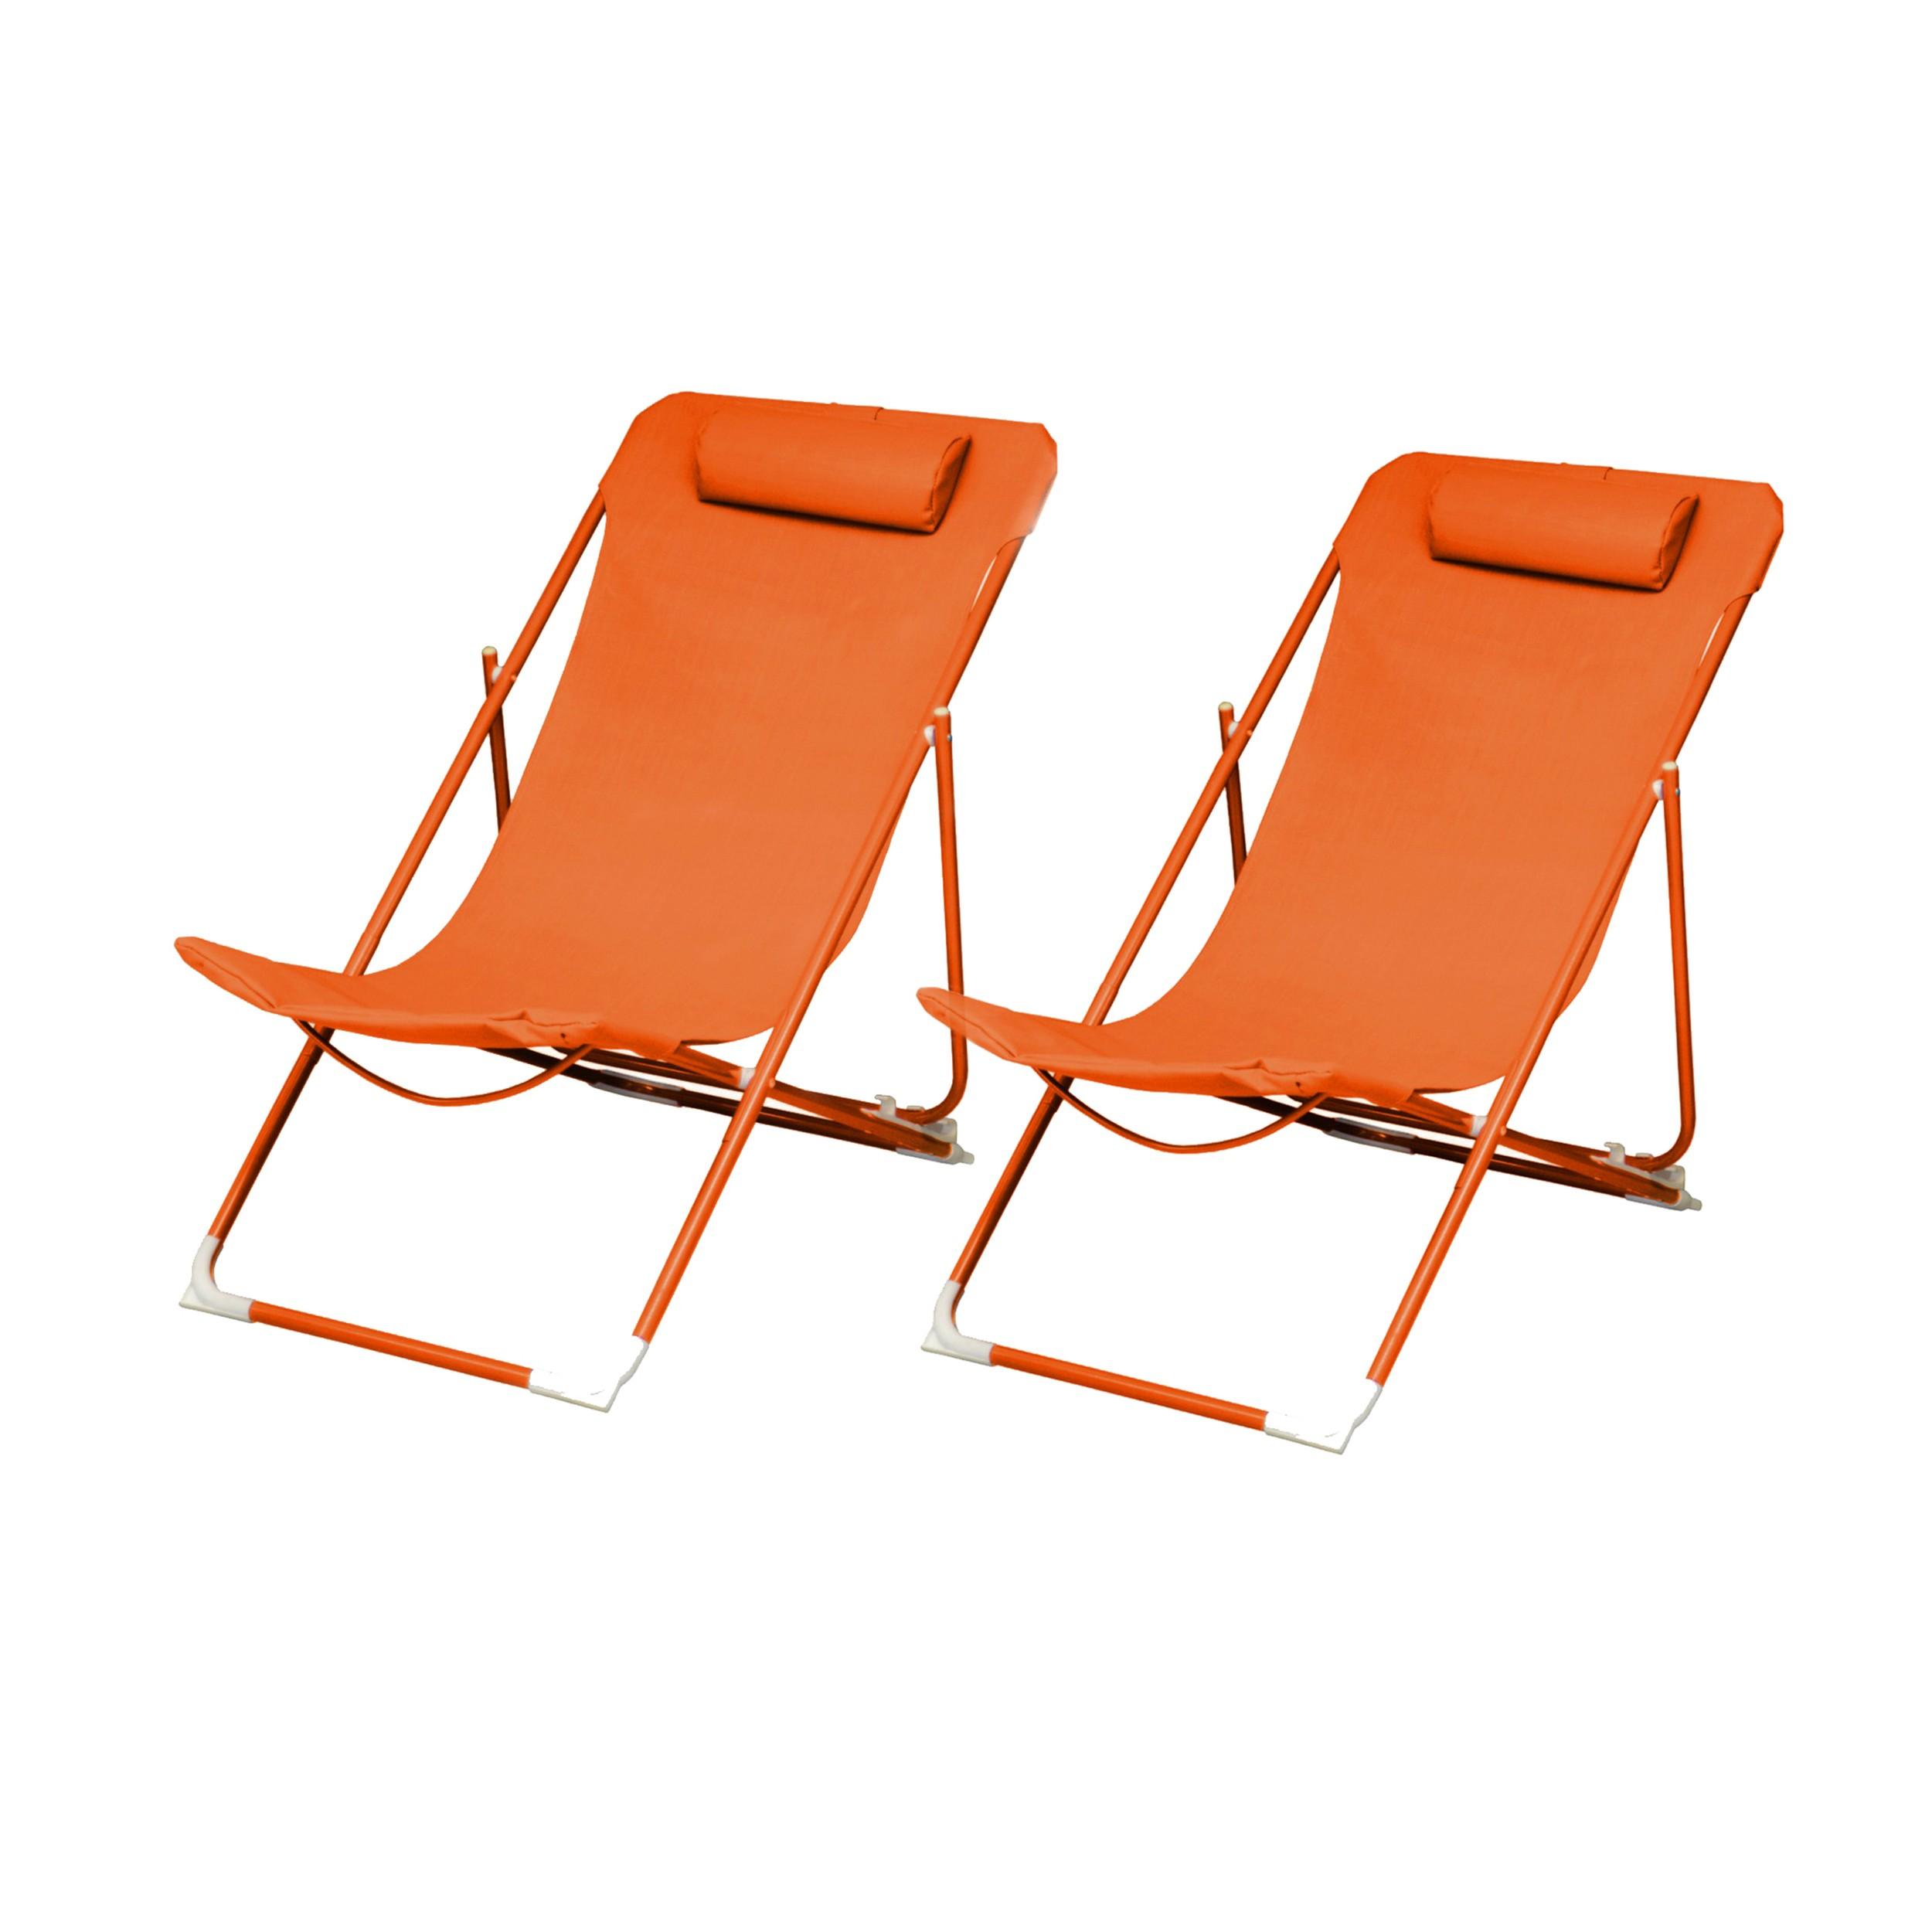 Acheter Chaise Longue Orange